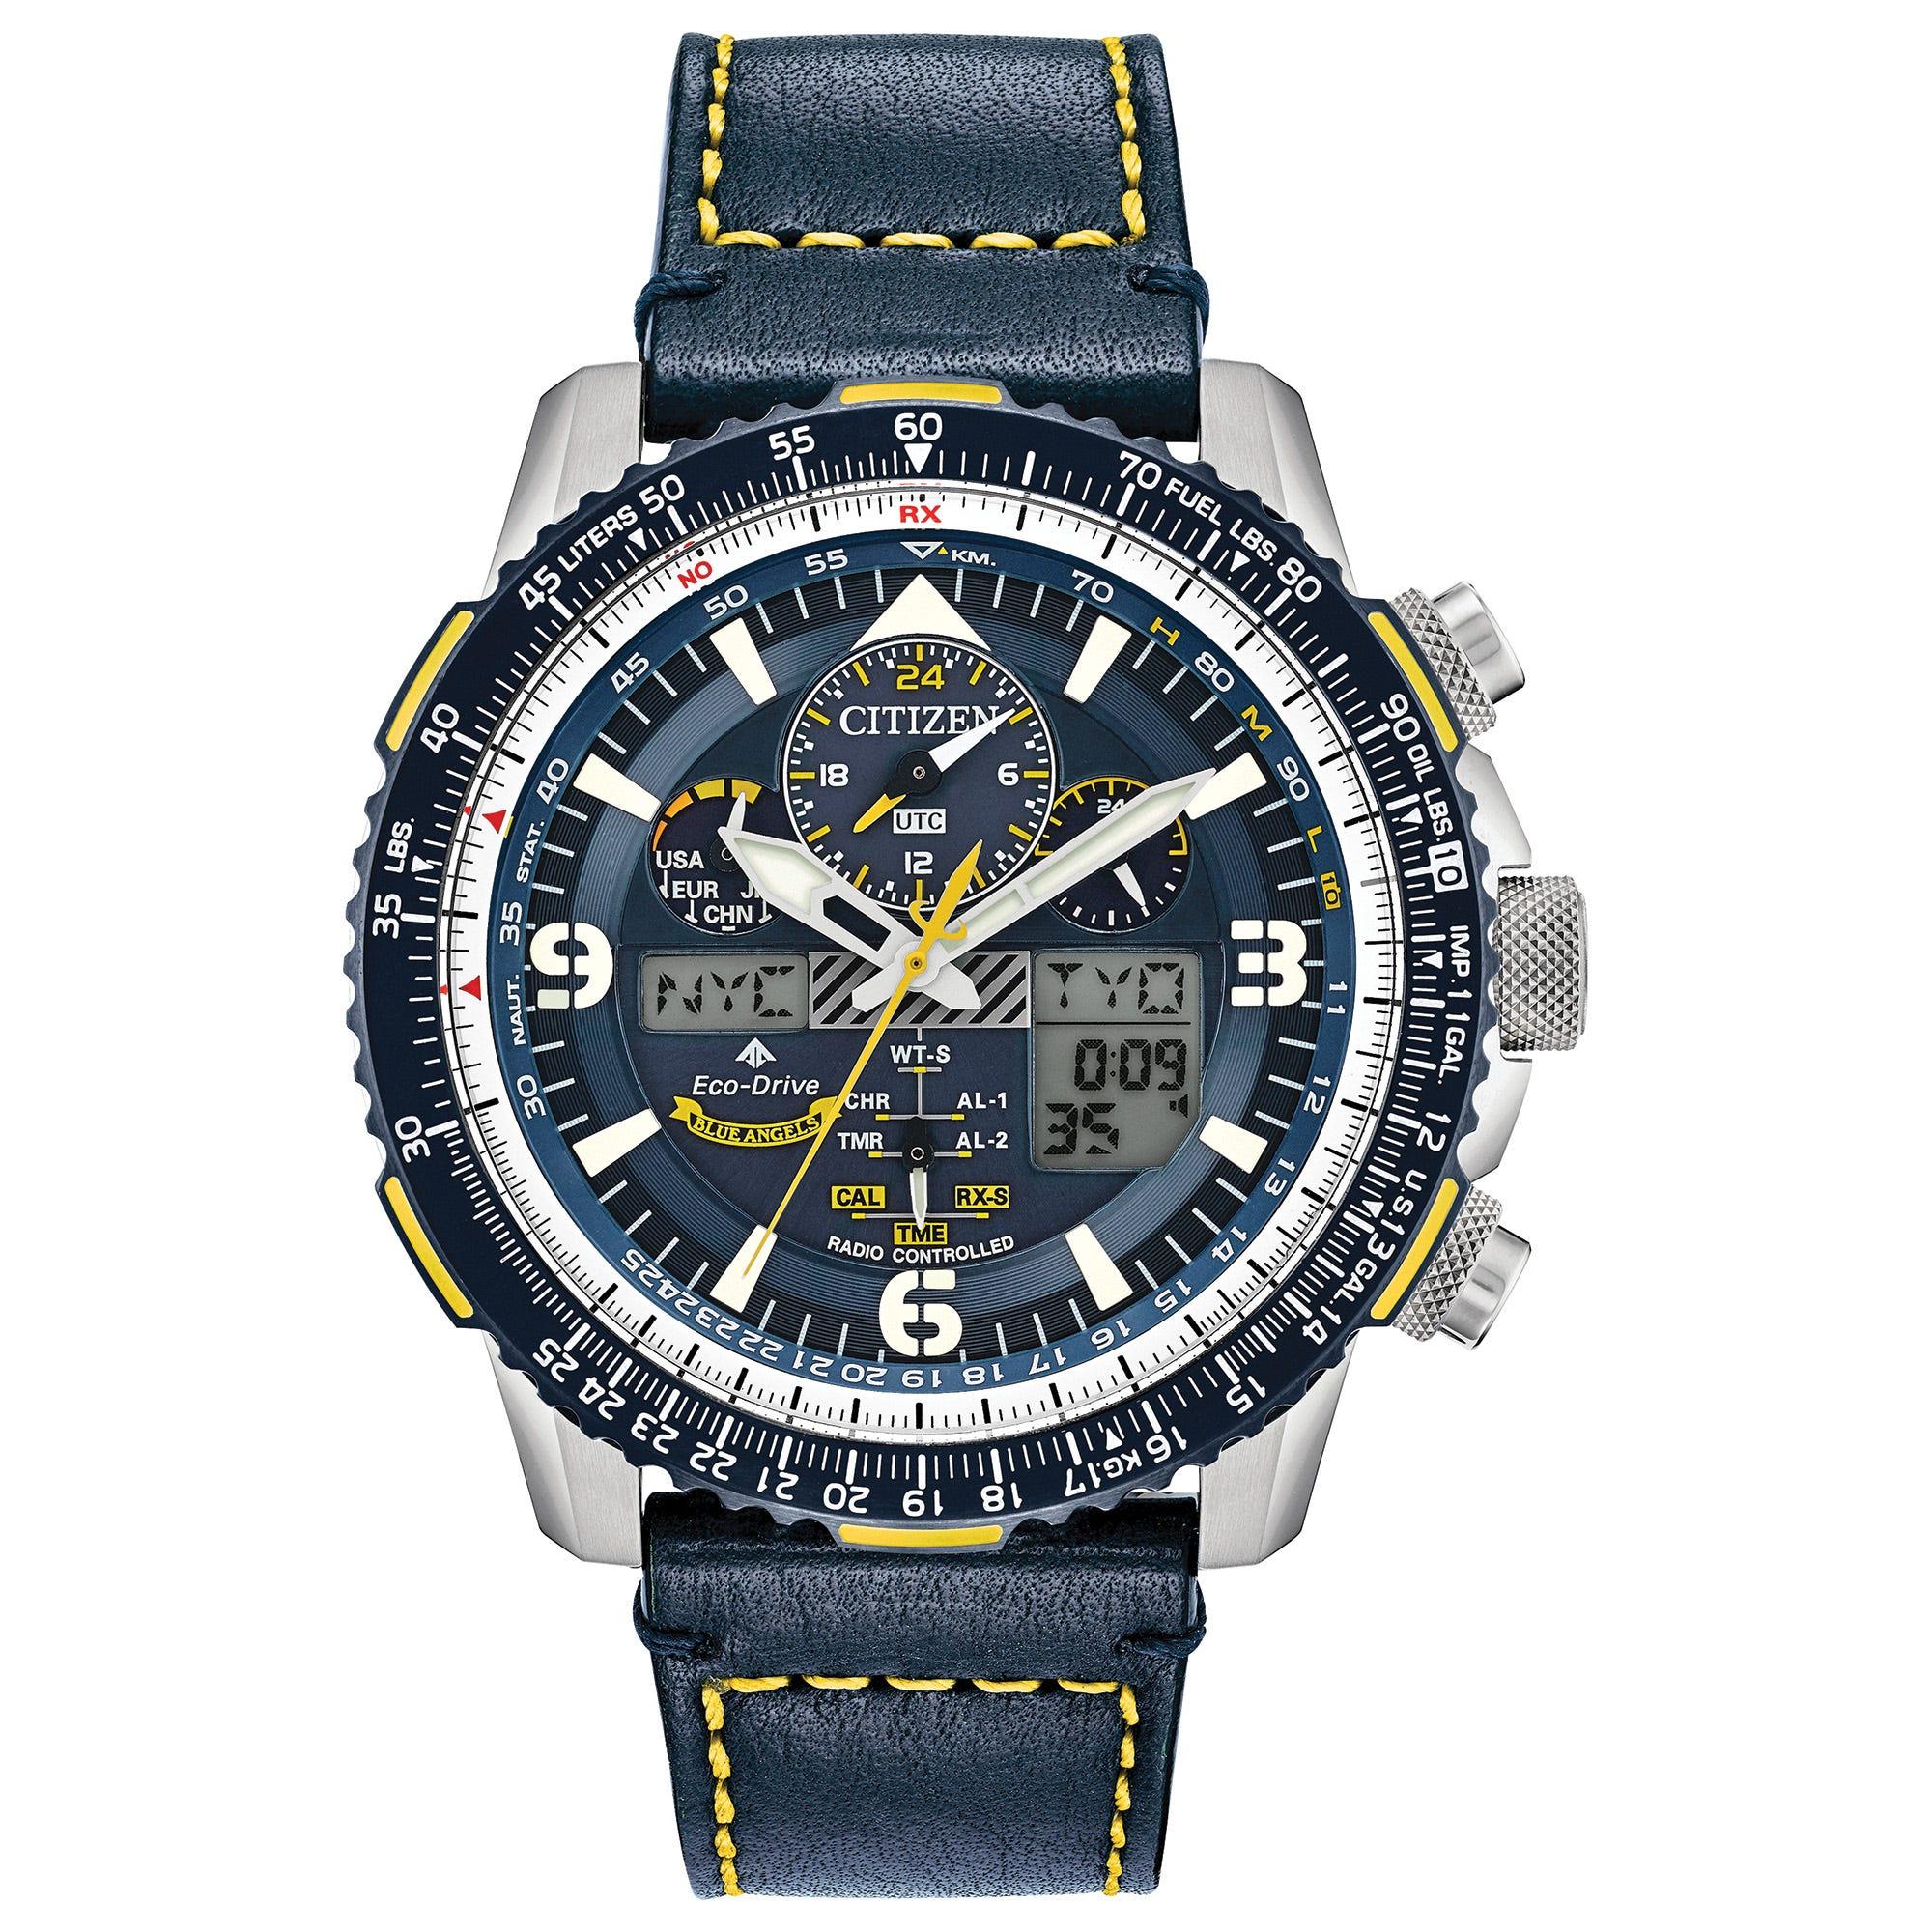 Citizen Men S Limited Edition Promaster Skyhawk A T Super Titanium Silver Watch